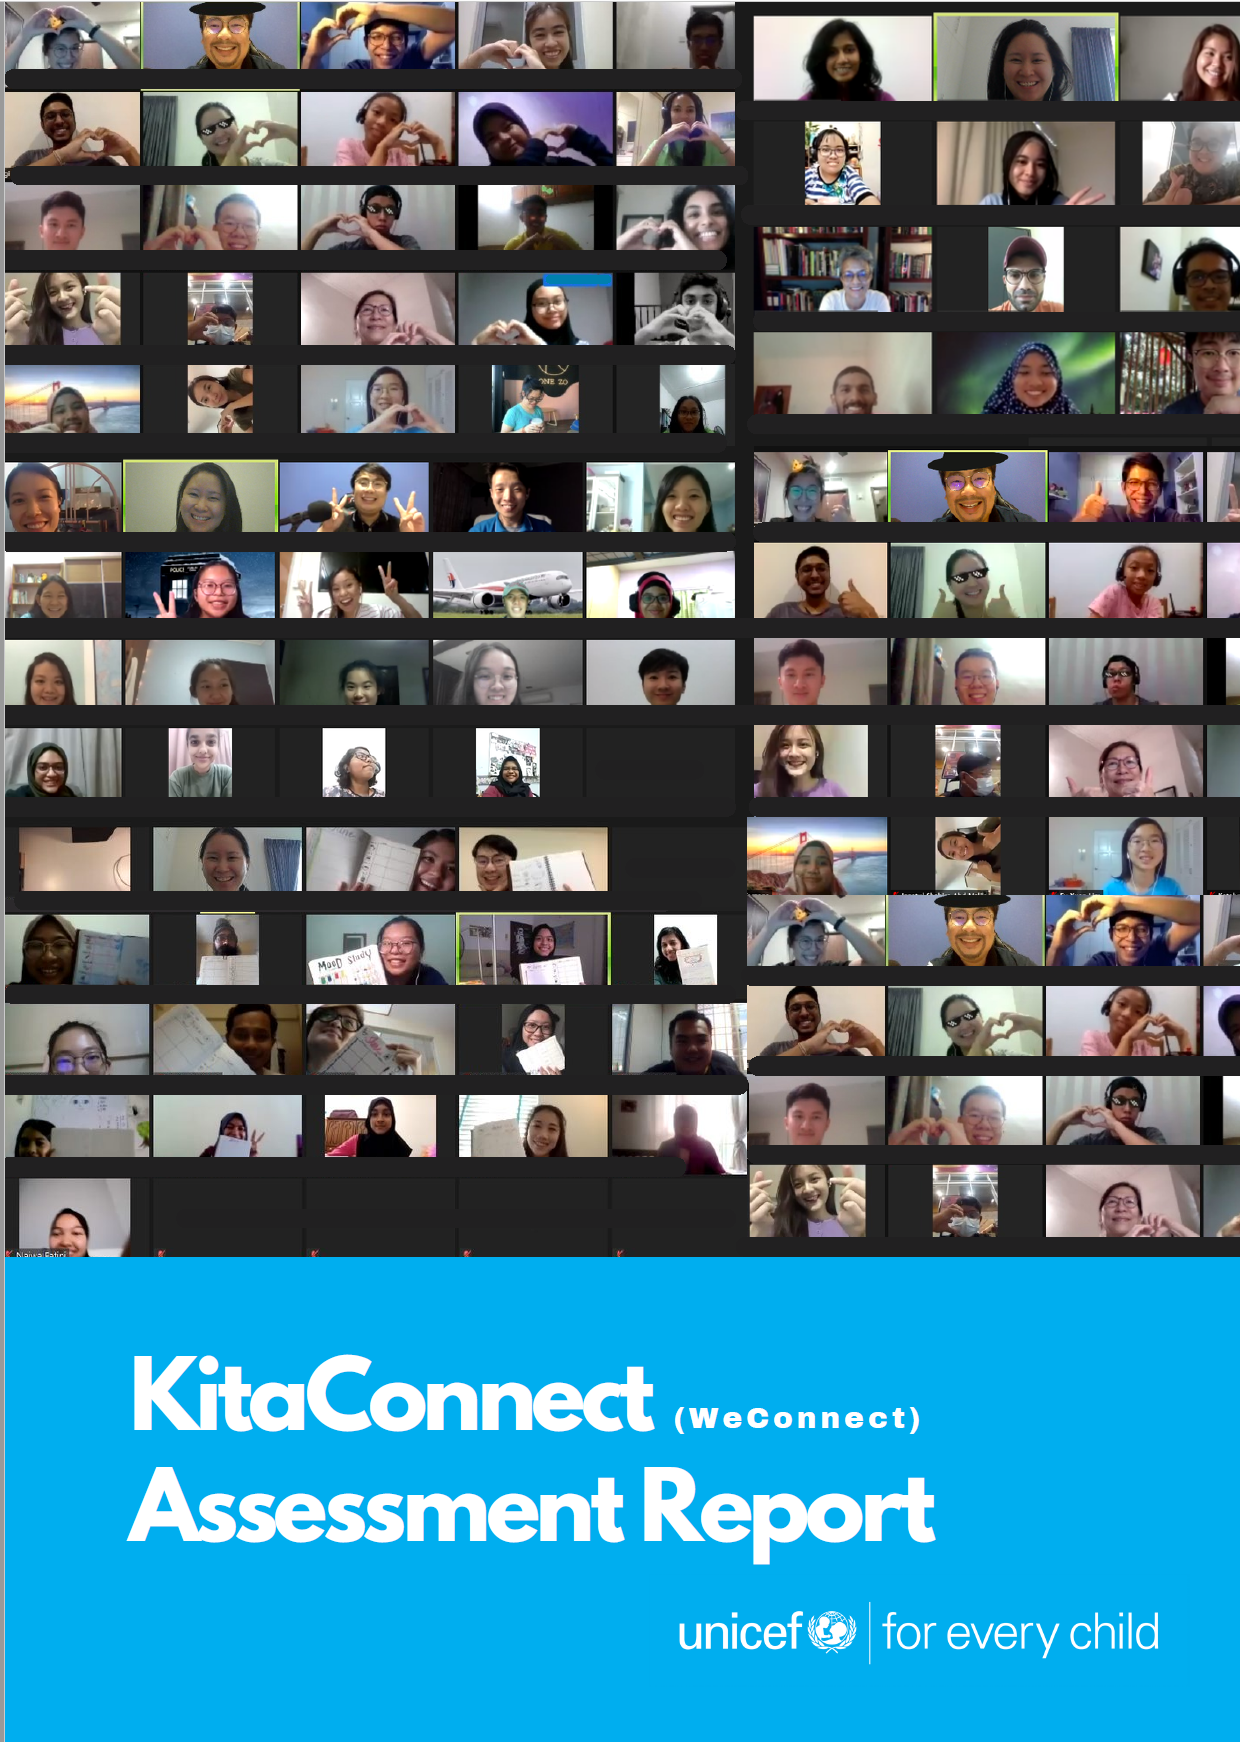 KitaConnect Assessment Report